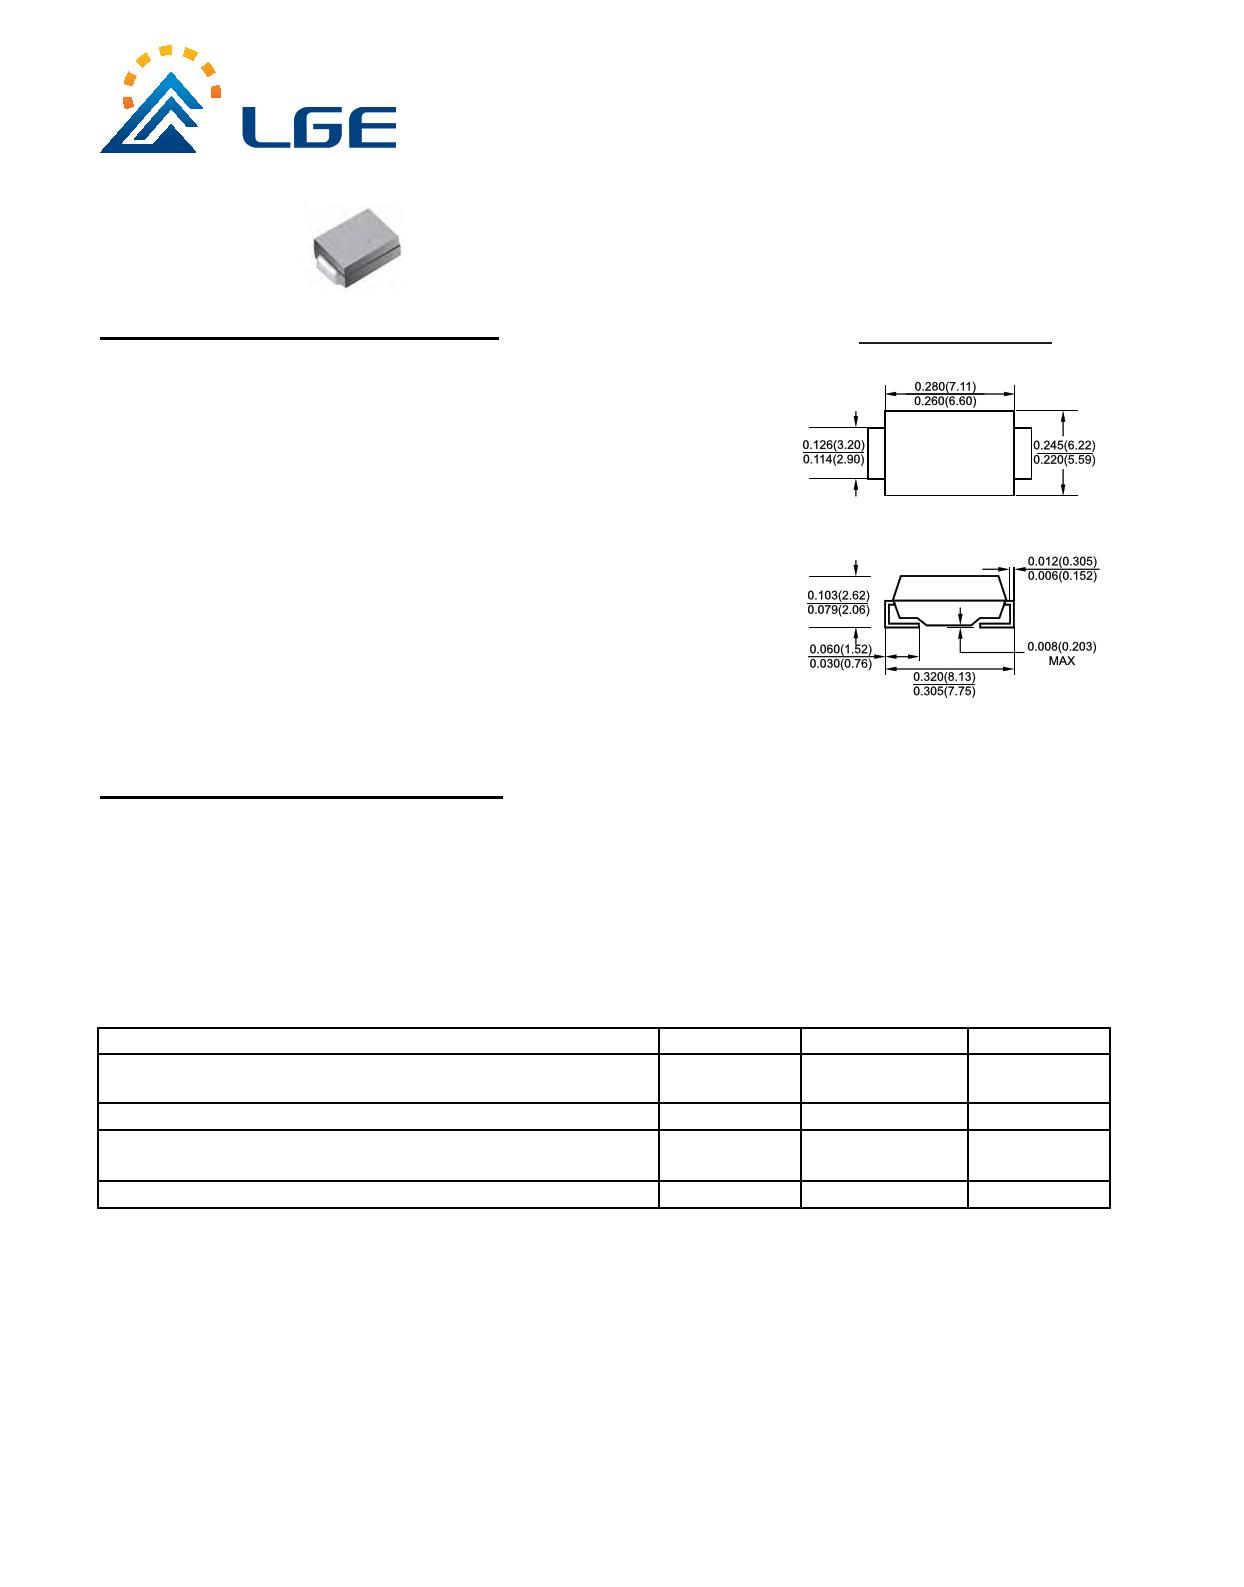 5.0SMDJ100A 데이터시트 및 5.0SMDJ100A PDF